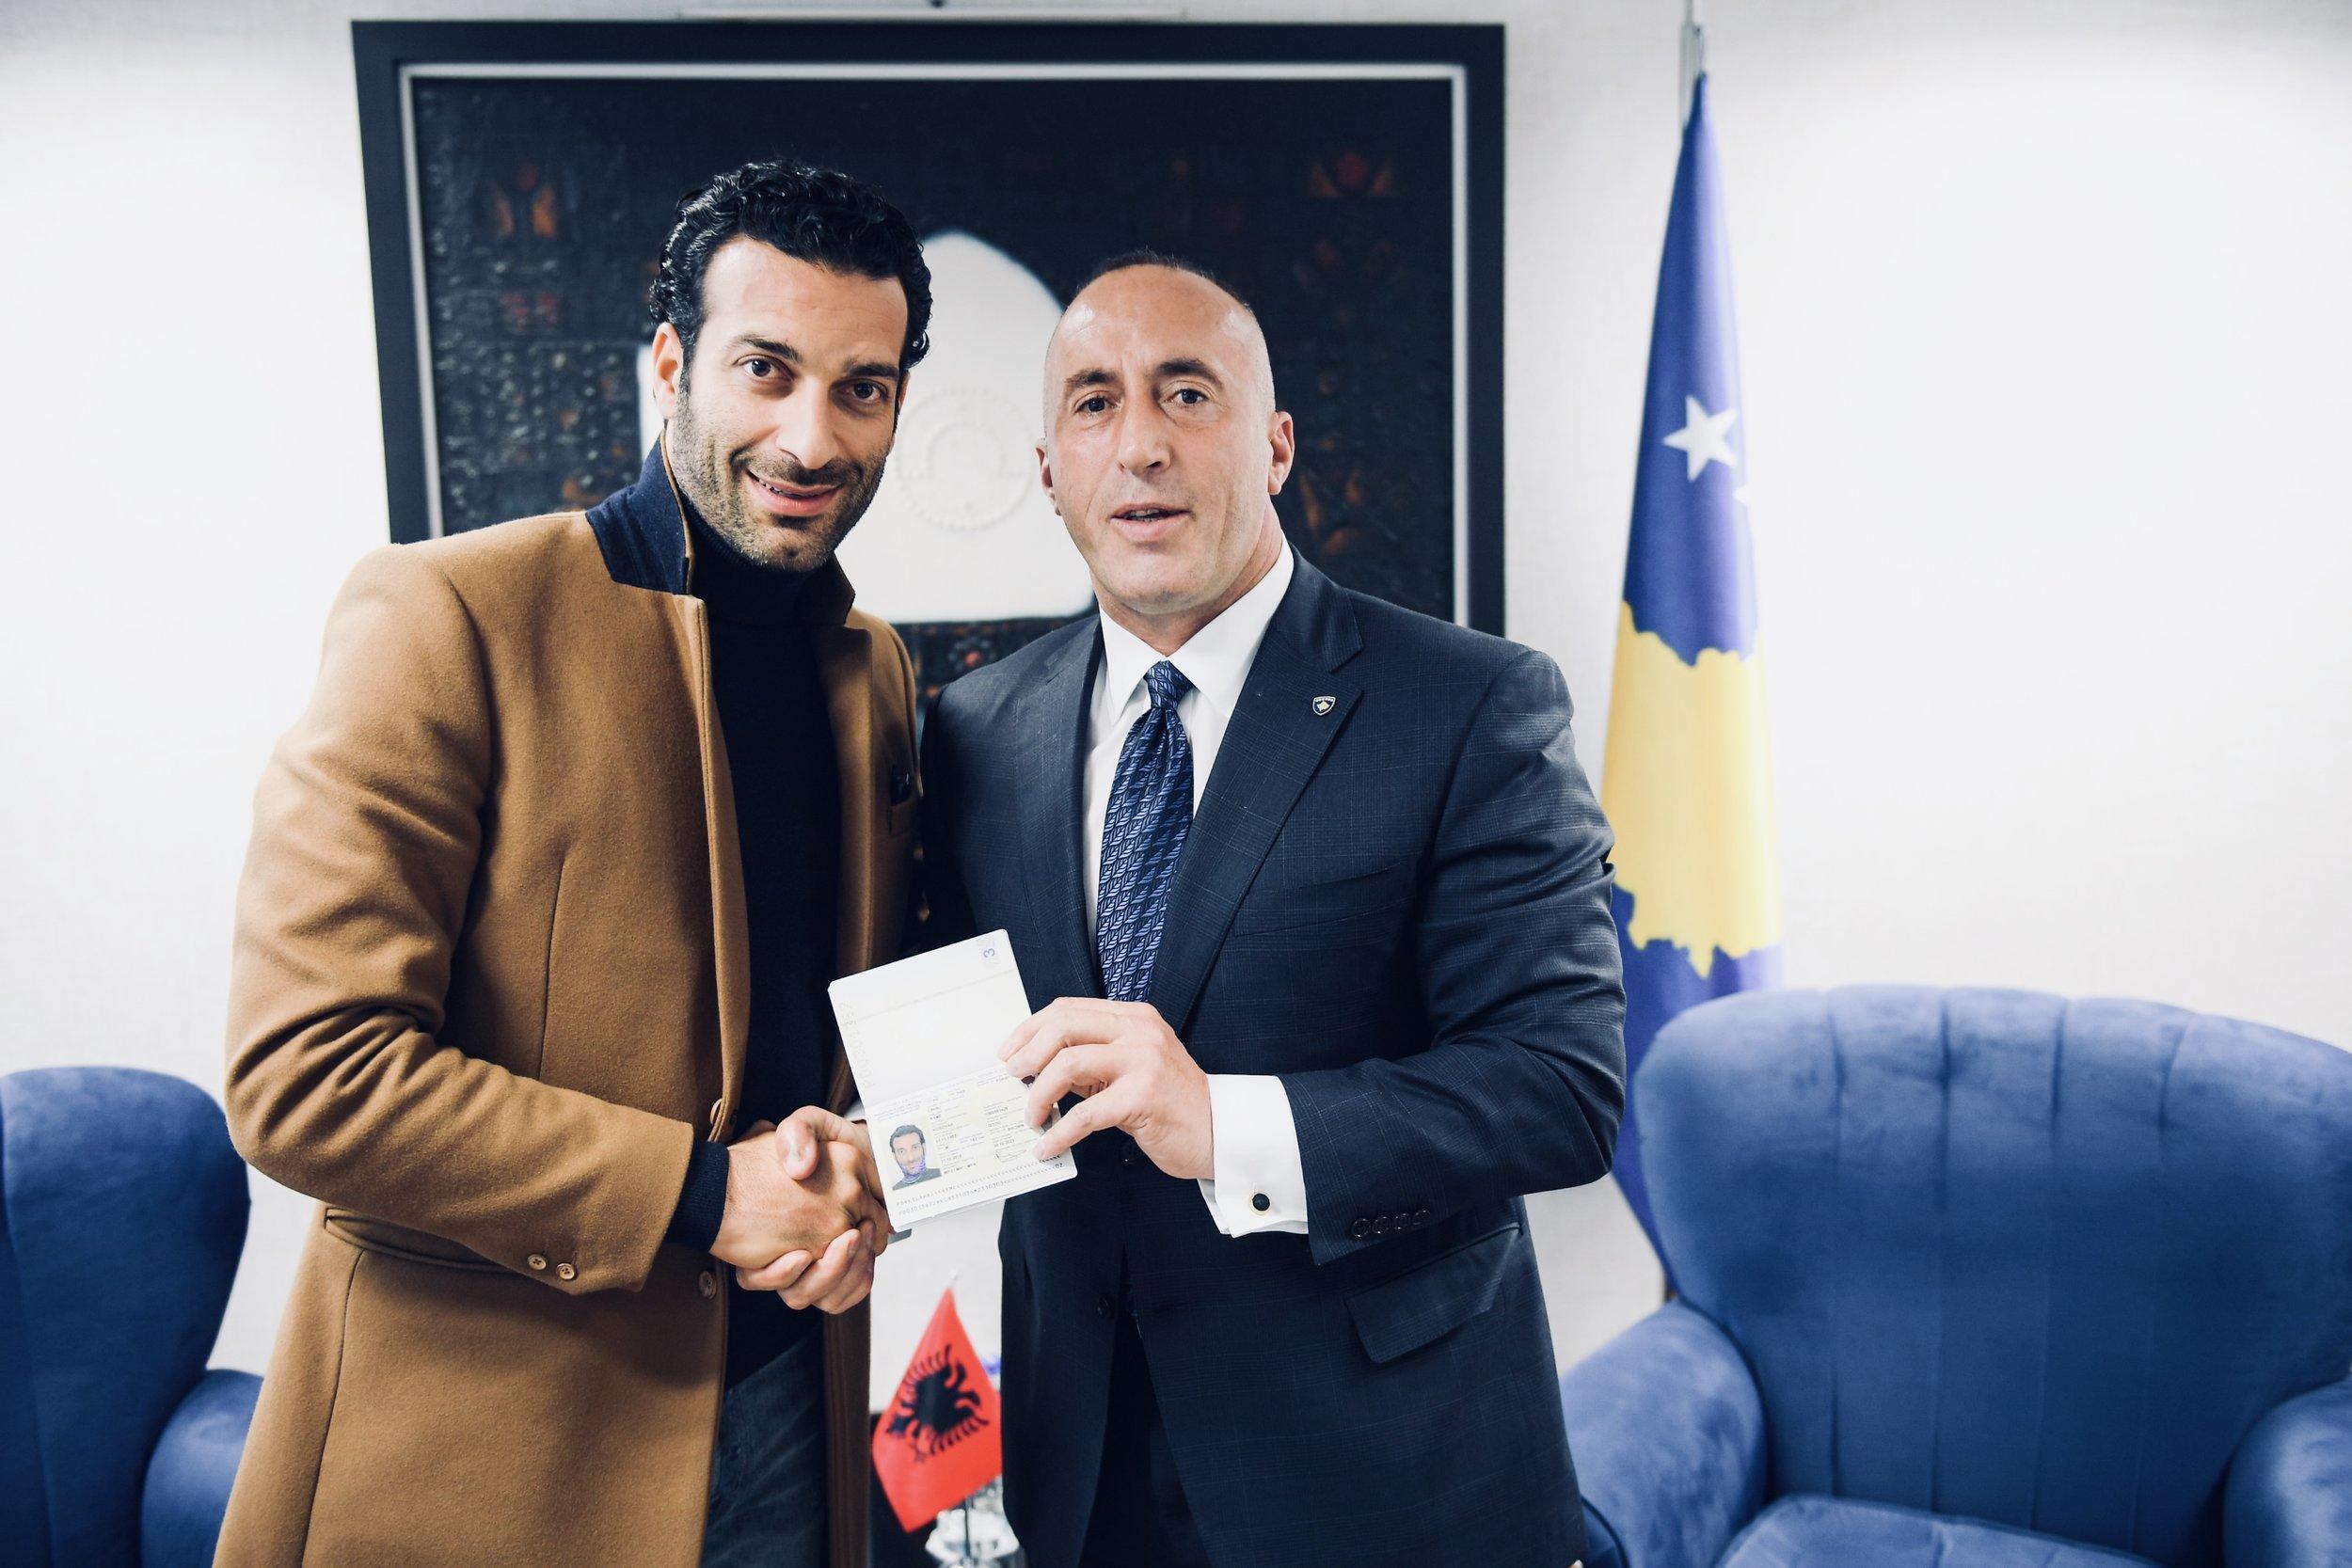 Rame Lahaj receiving diplomatic passport by Kosovan Prime minister, Ramush Haradinaj. Officially during this ceremony Lahaj became global Ambassador for Culture.